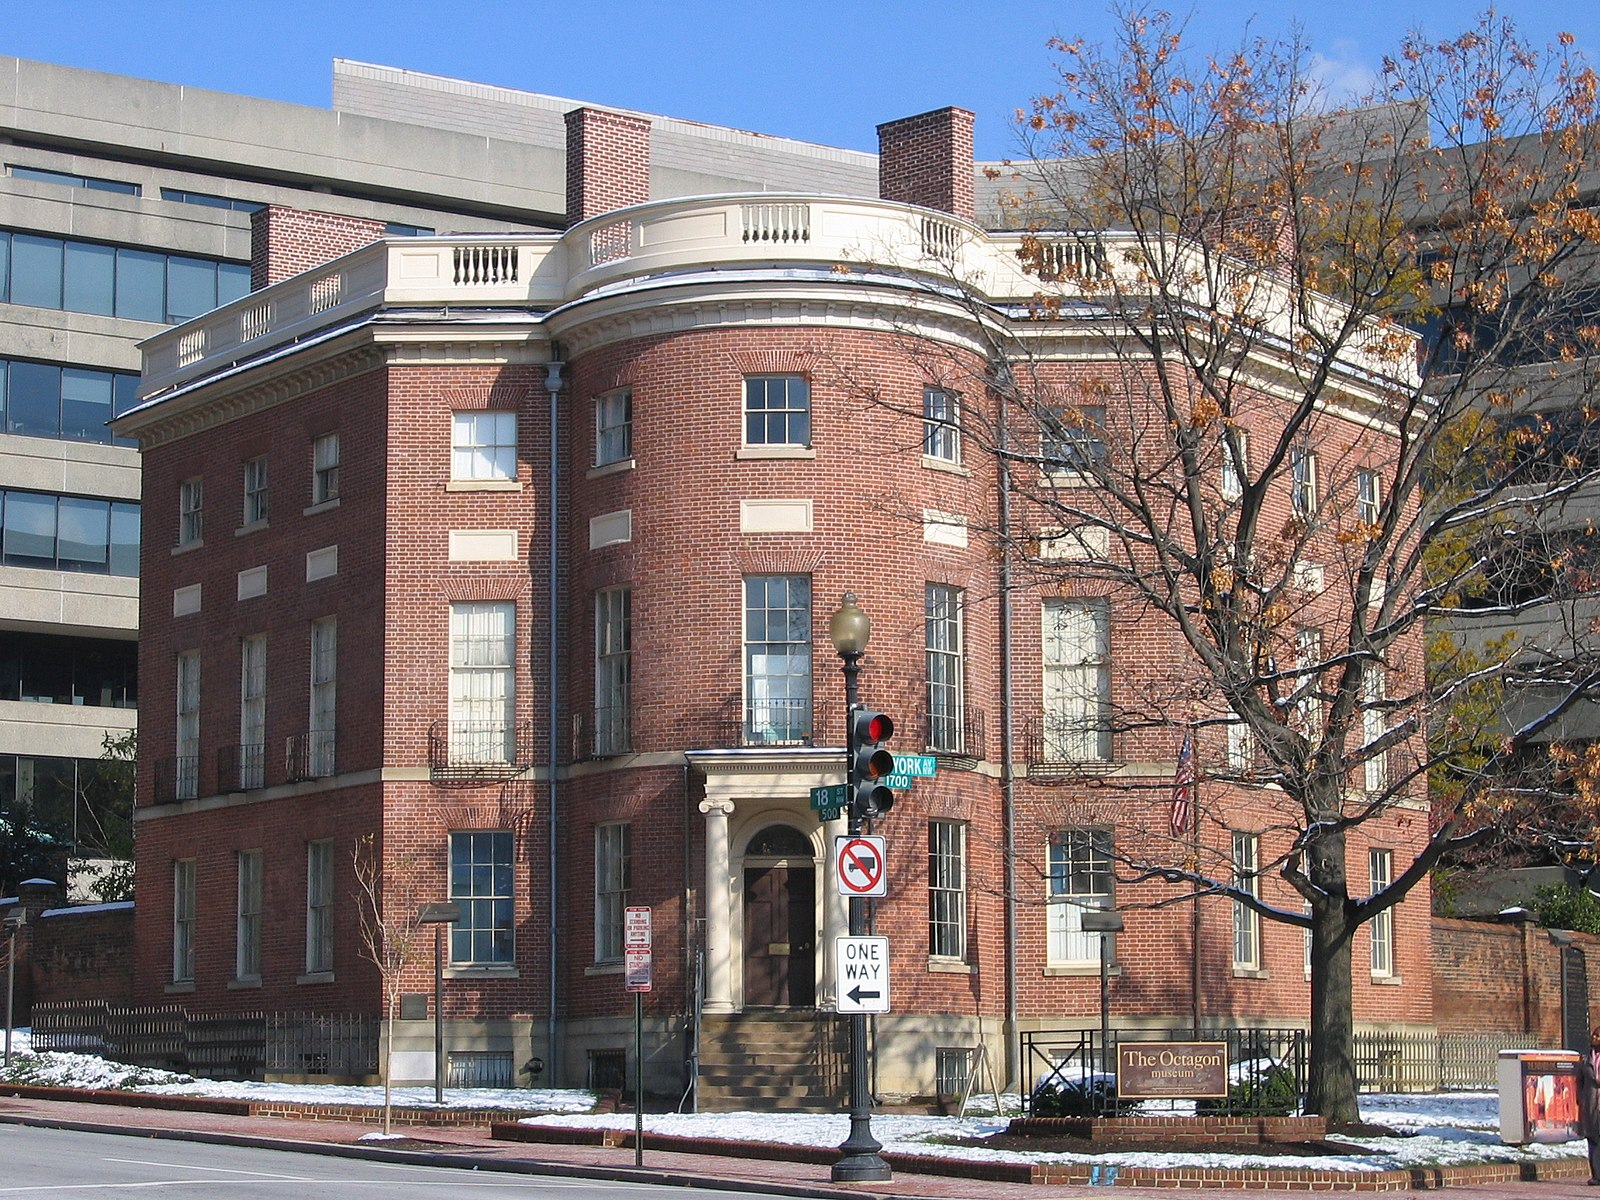 AIA HQ Octagon House Washington DC